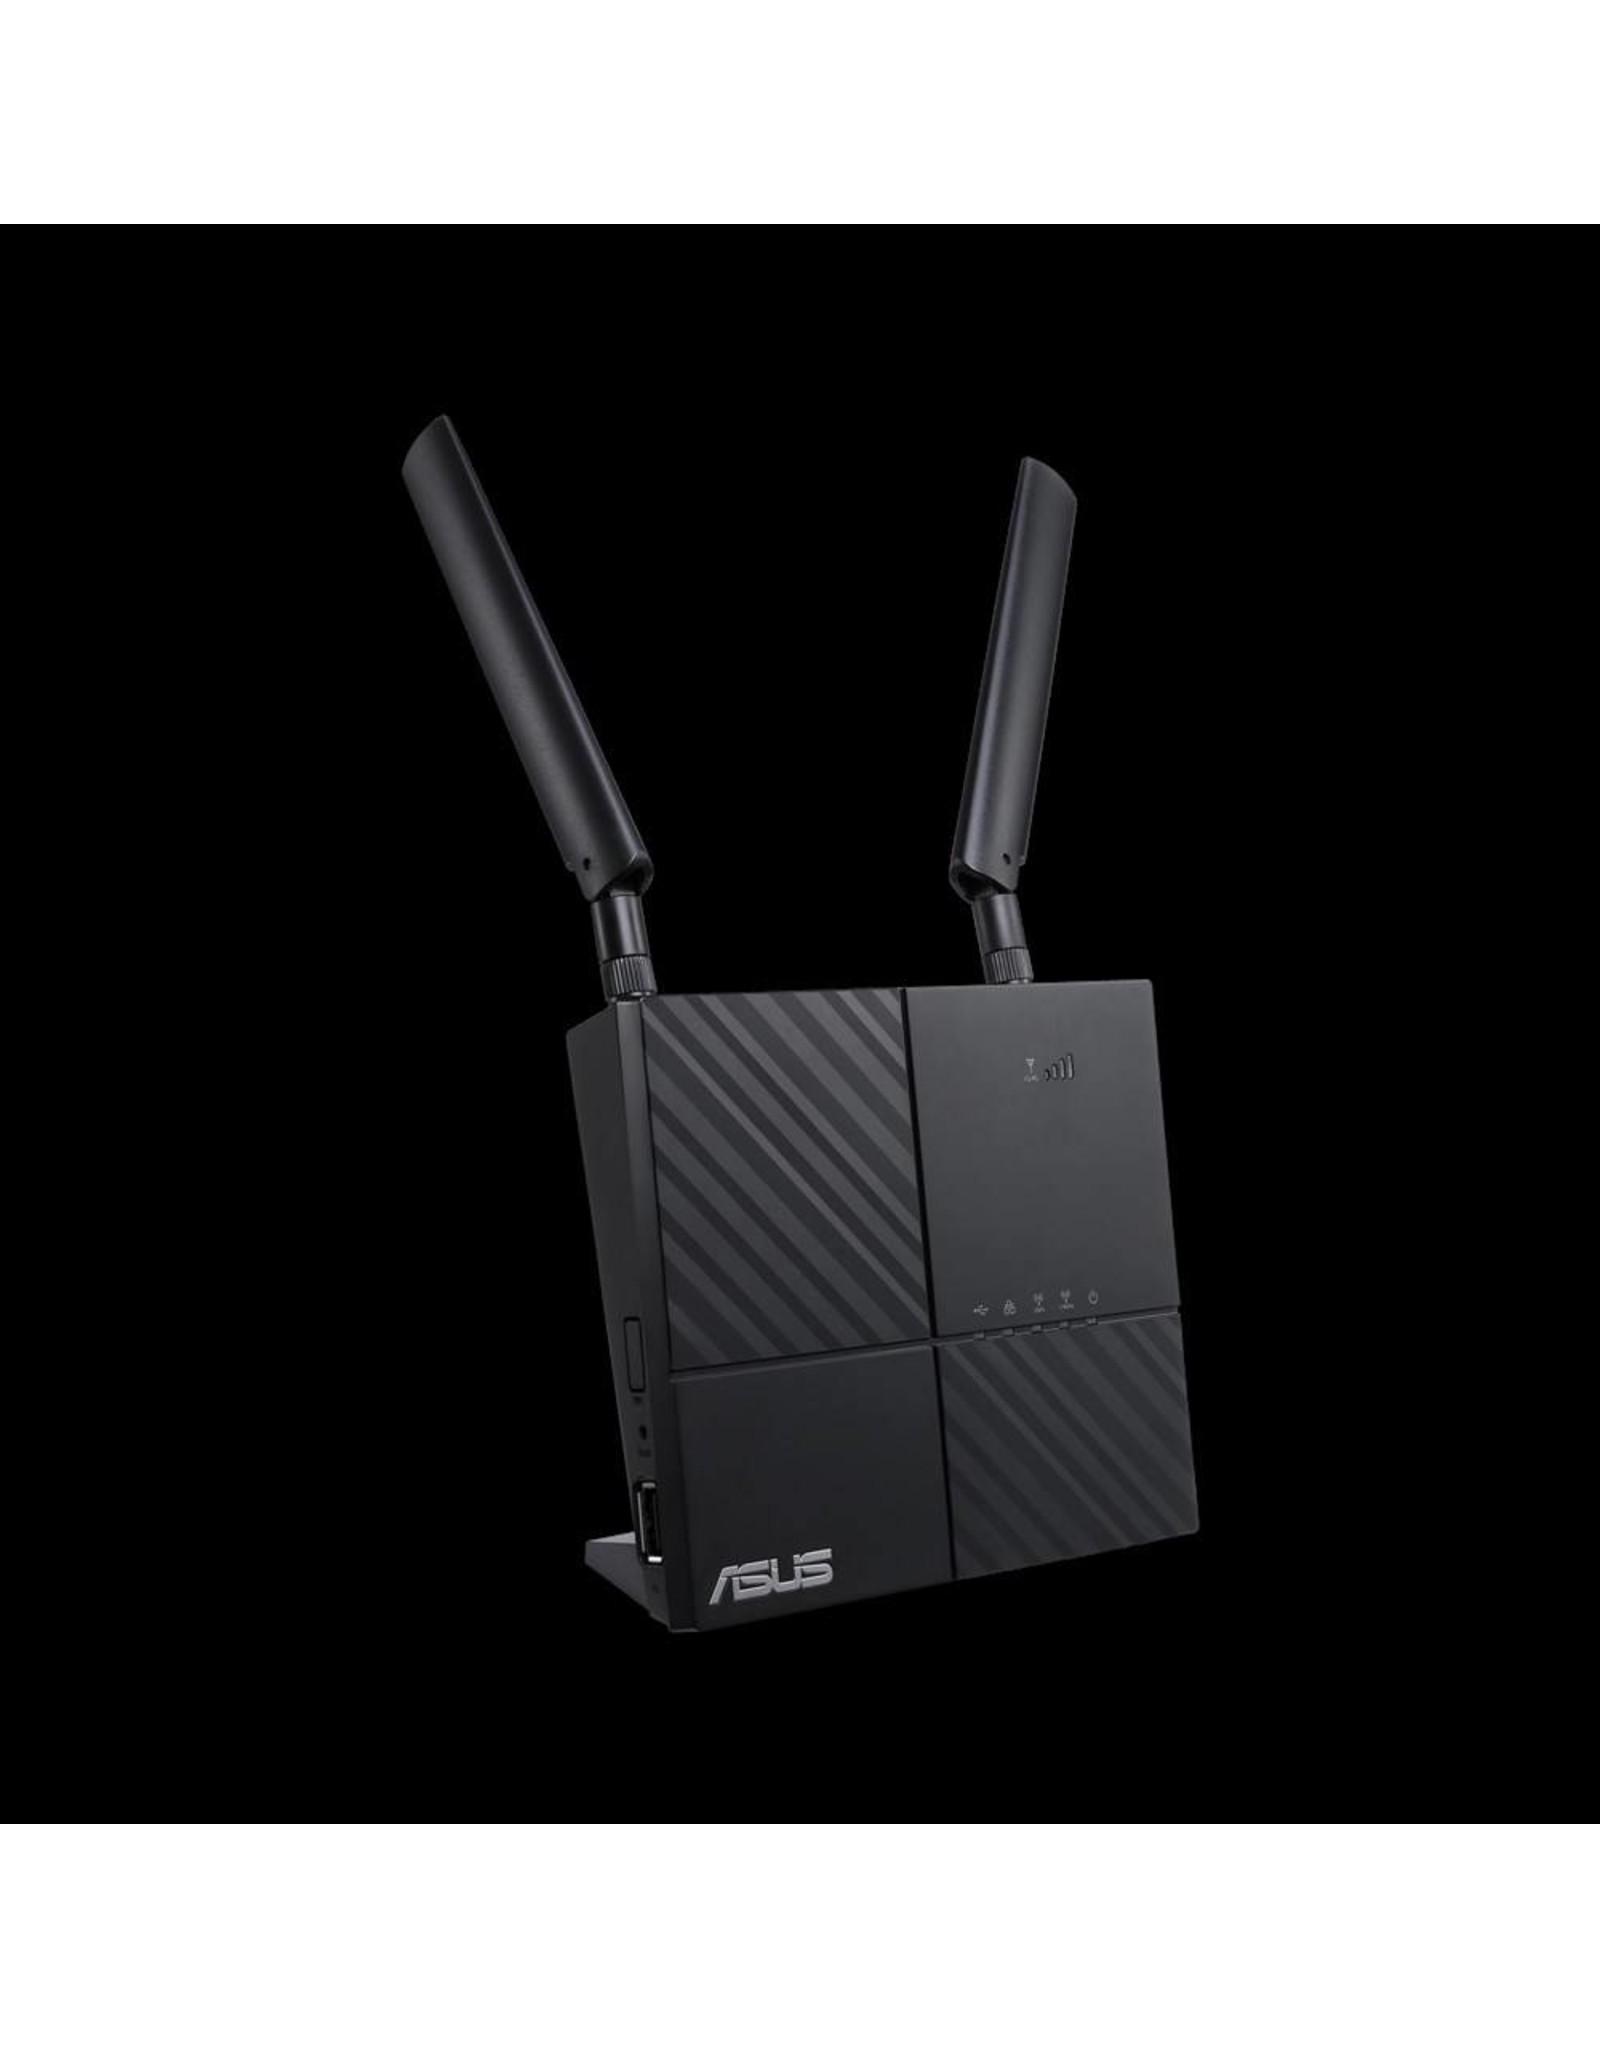 ASUS ASUS 4G-AC53U Dual-band Gigabit Ethernet 3G 4G draadloze router